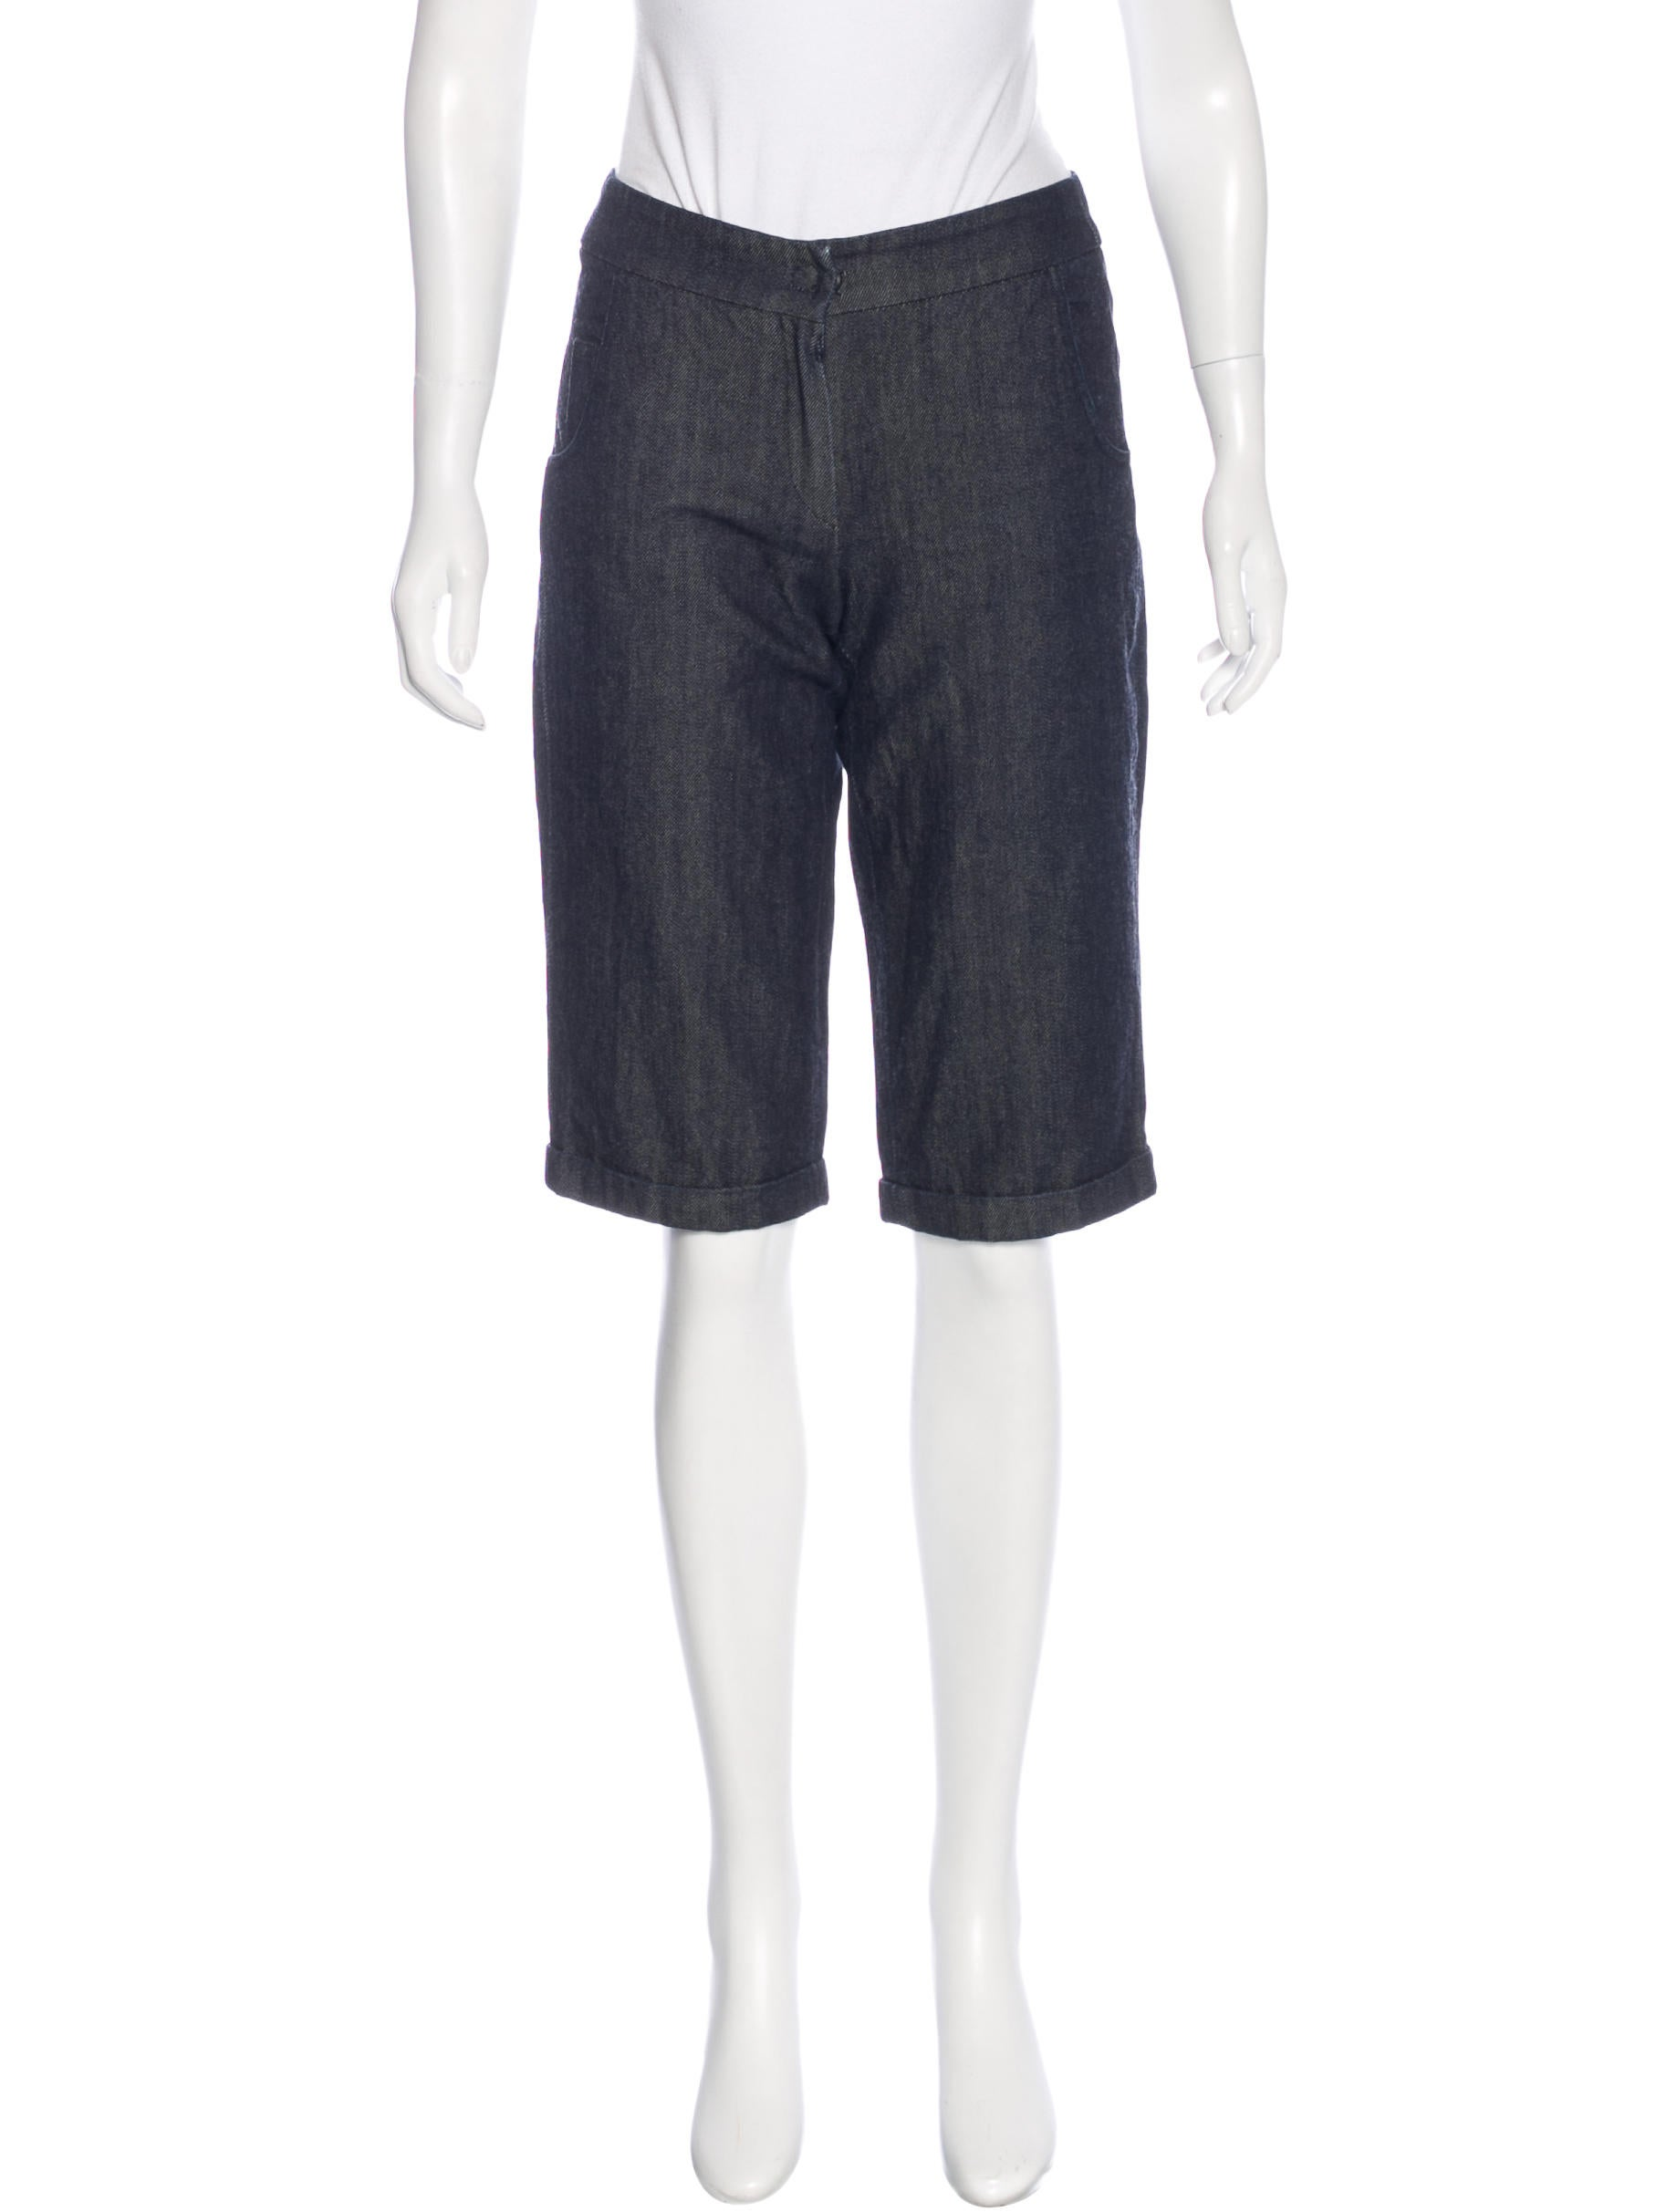 Akris Punto Knee-Length Denim Shorts - Clothing - WAK29491 ...